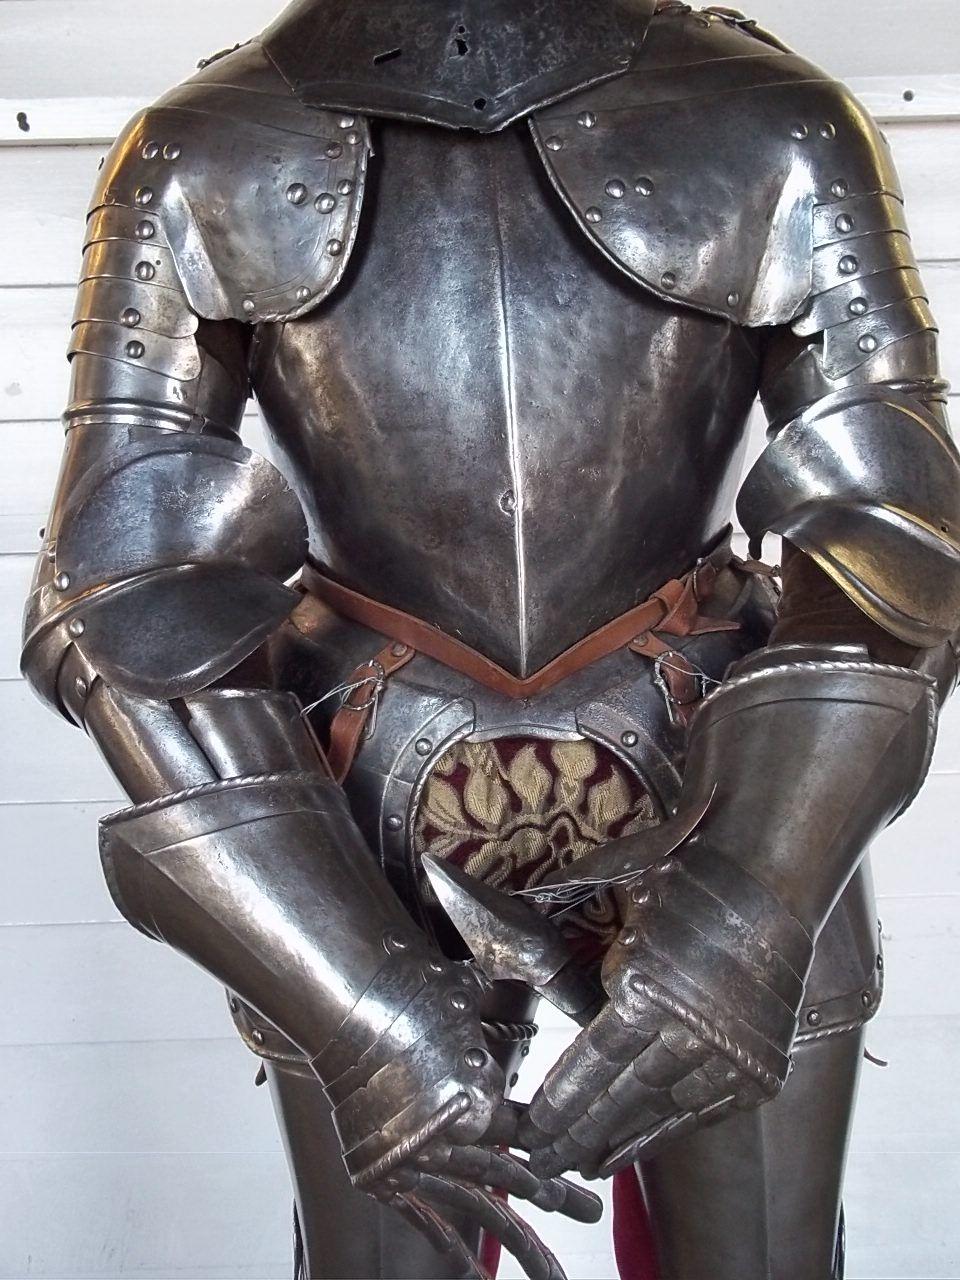 A body of armor